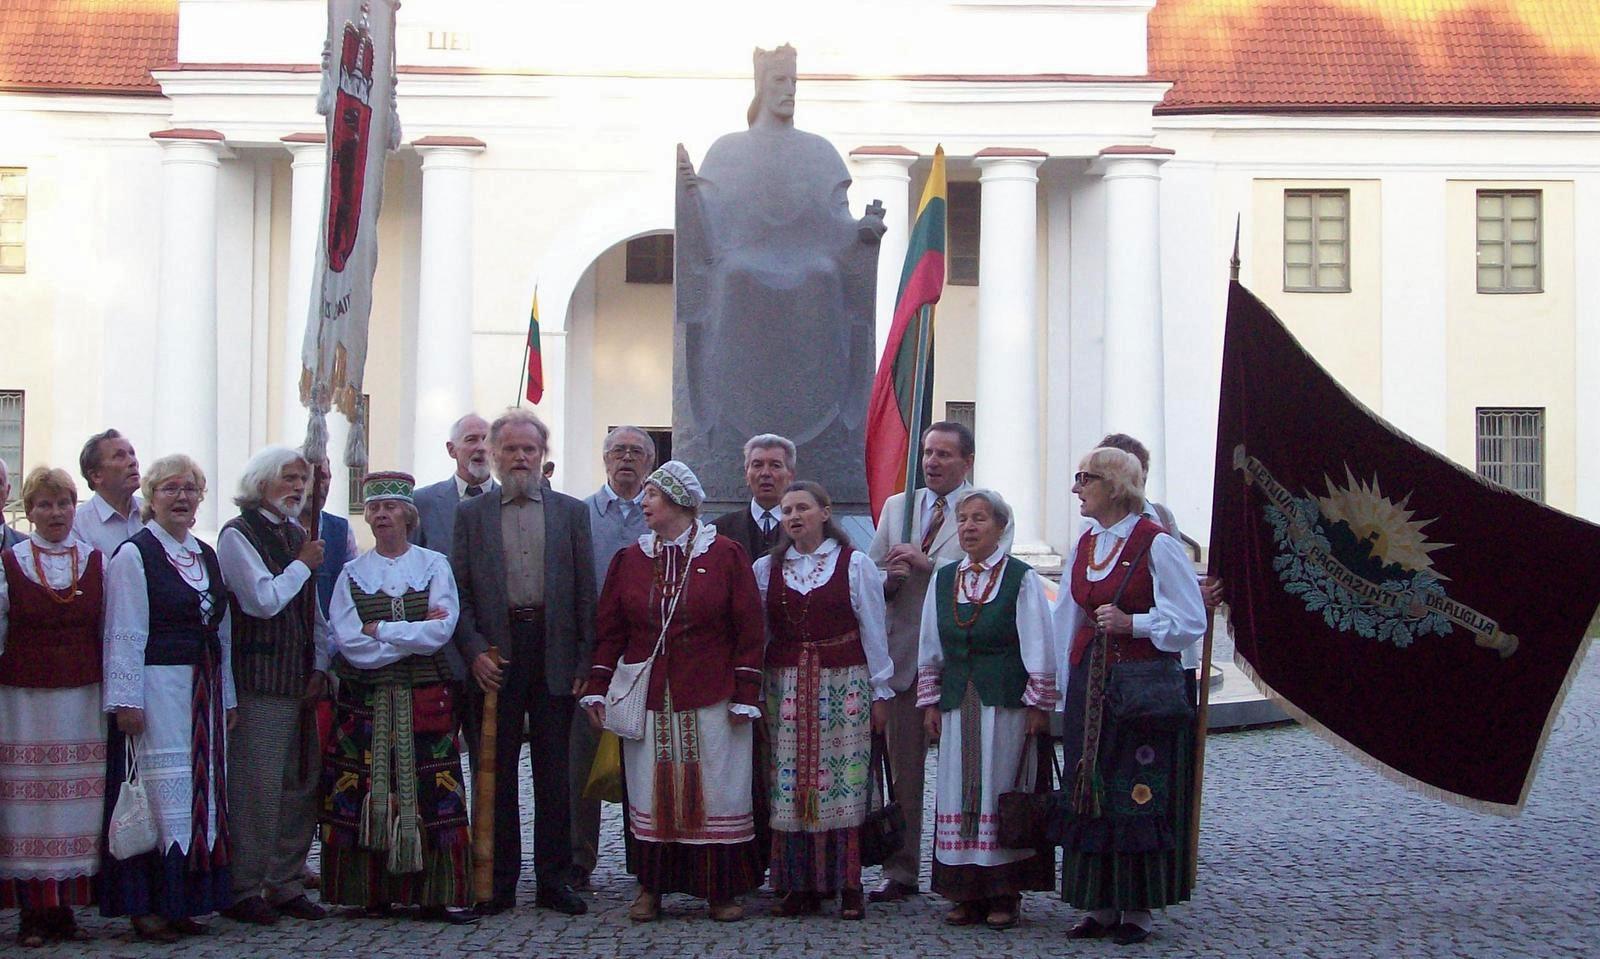 Denkmal des König Mindaugas